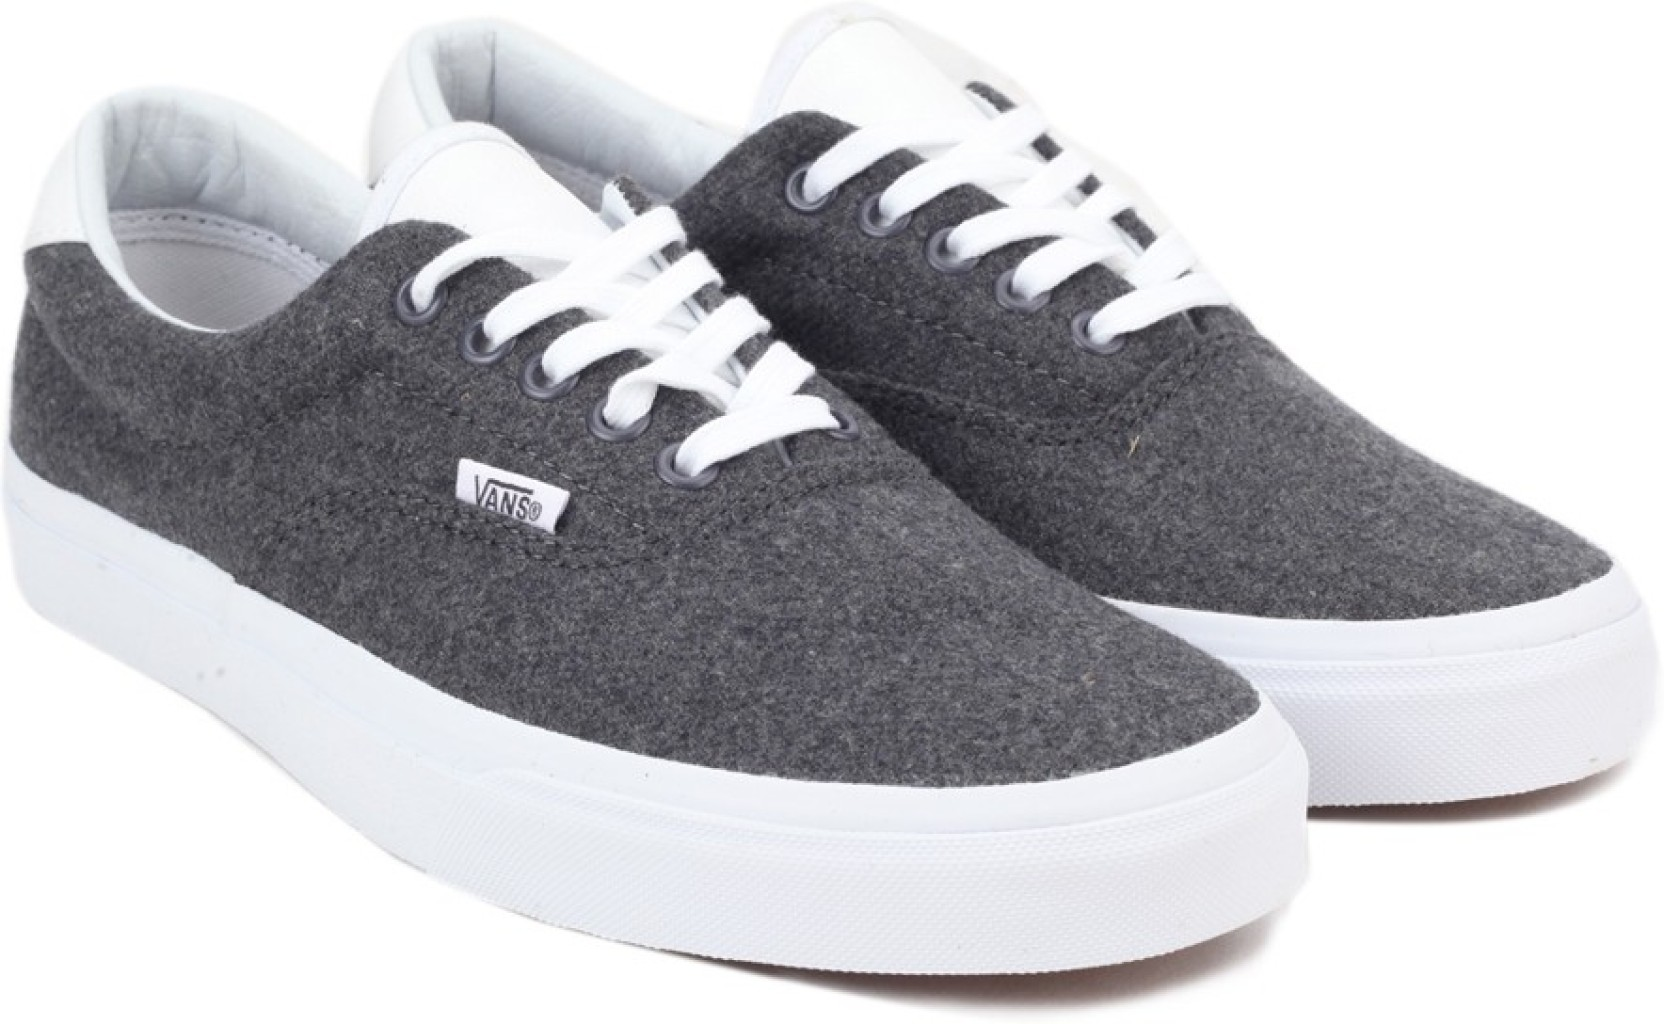 Vans Era 59 Sneakers For Men - Buy Black Color Vans Era 59 Sneakers ... 3ad546057